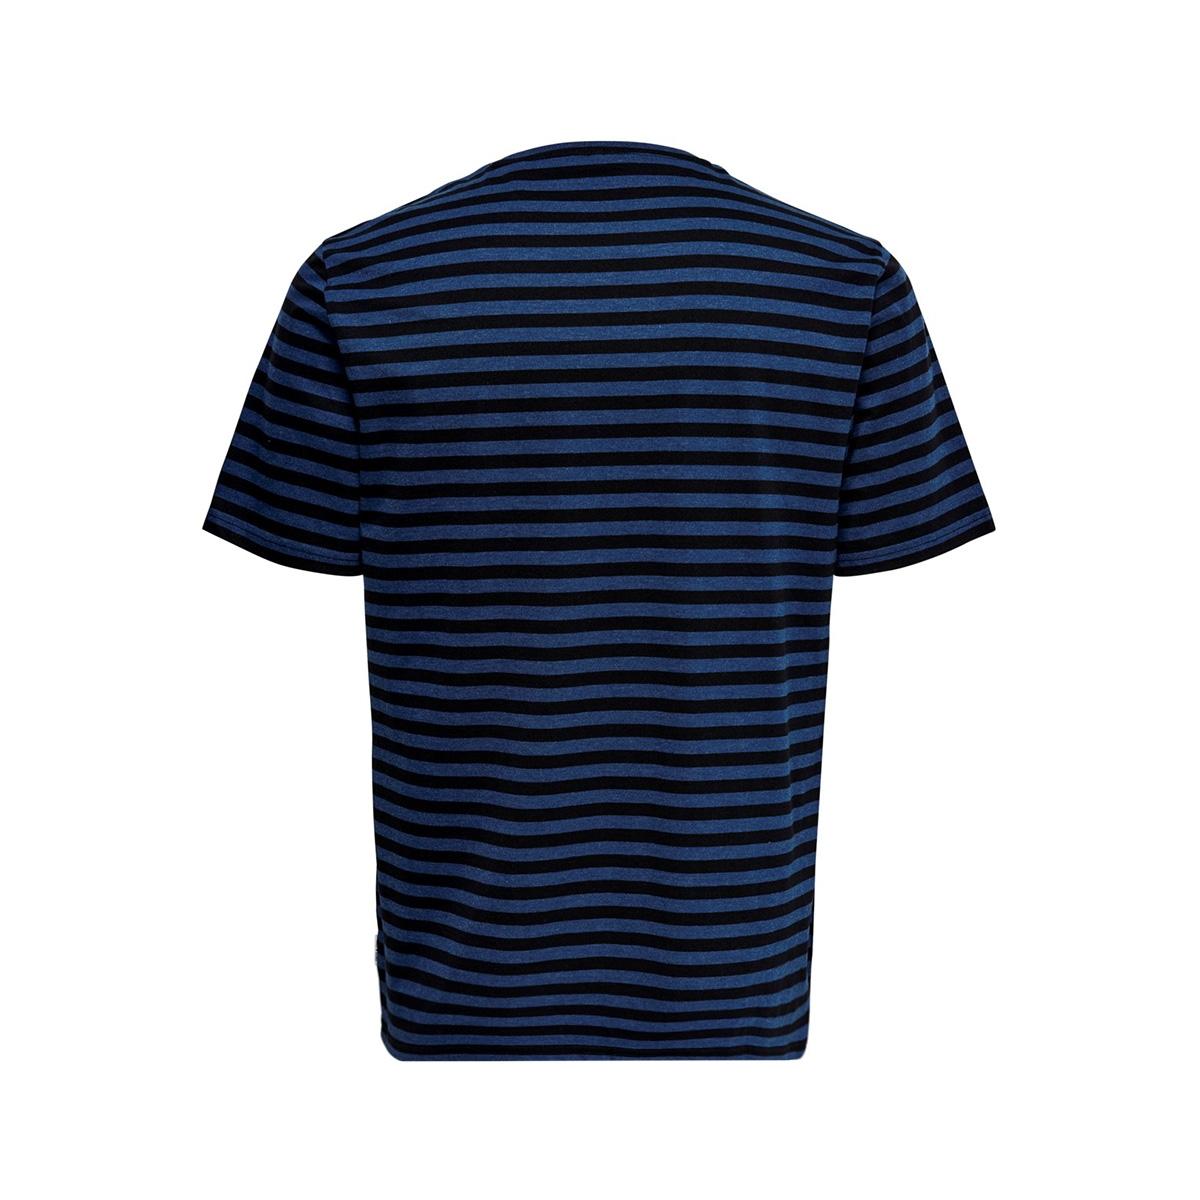 onsjamie ss stripe reg tee noos 22013203 only & sons t-shirt estate blue/black